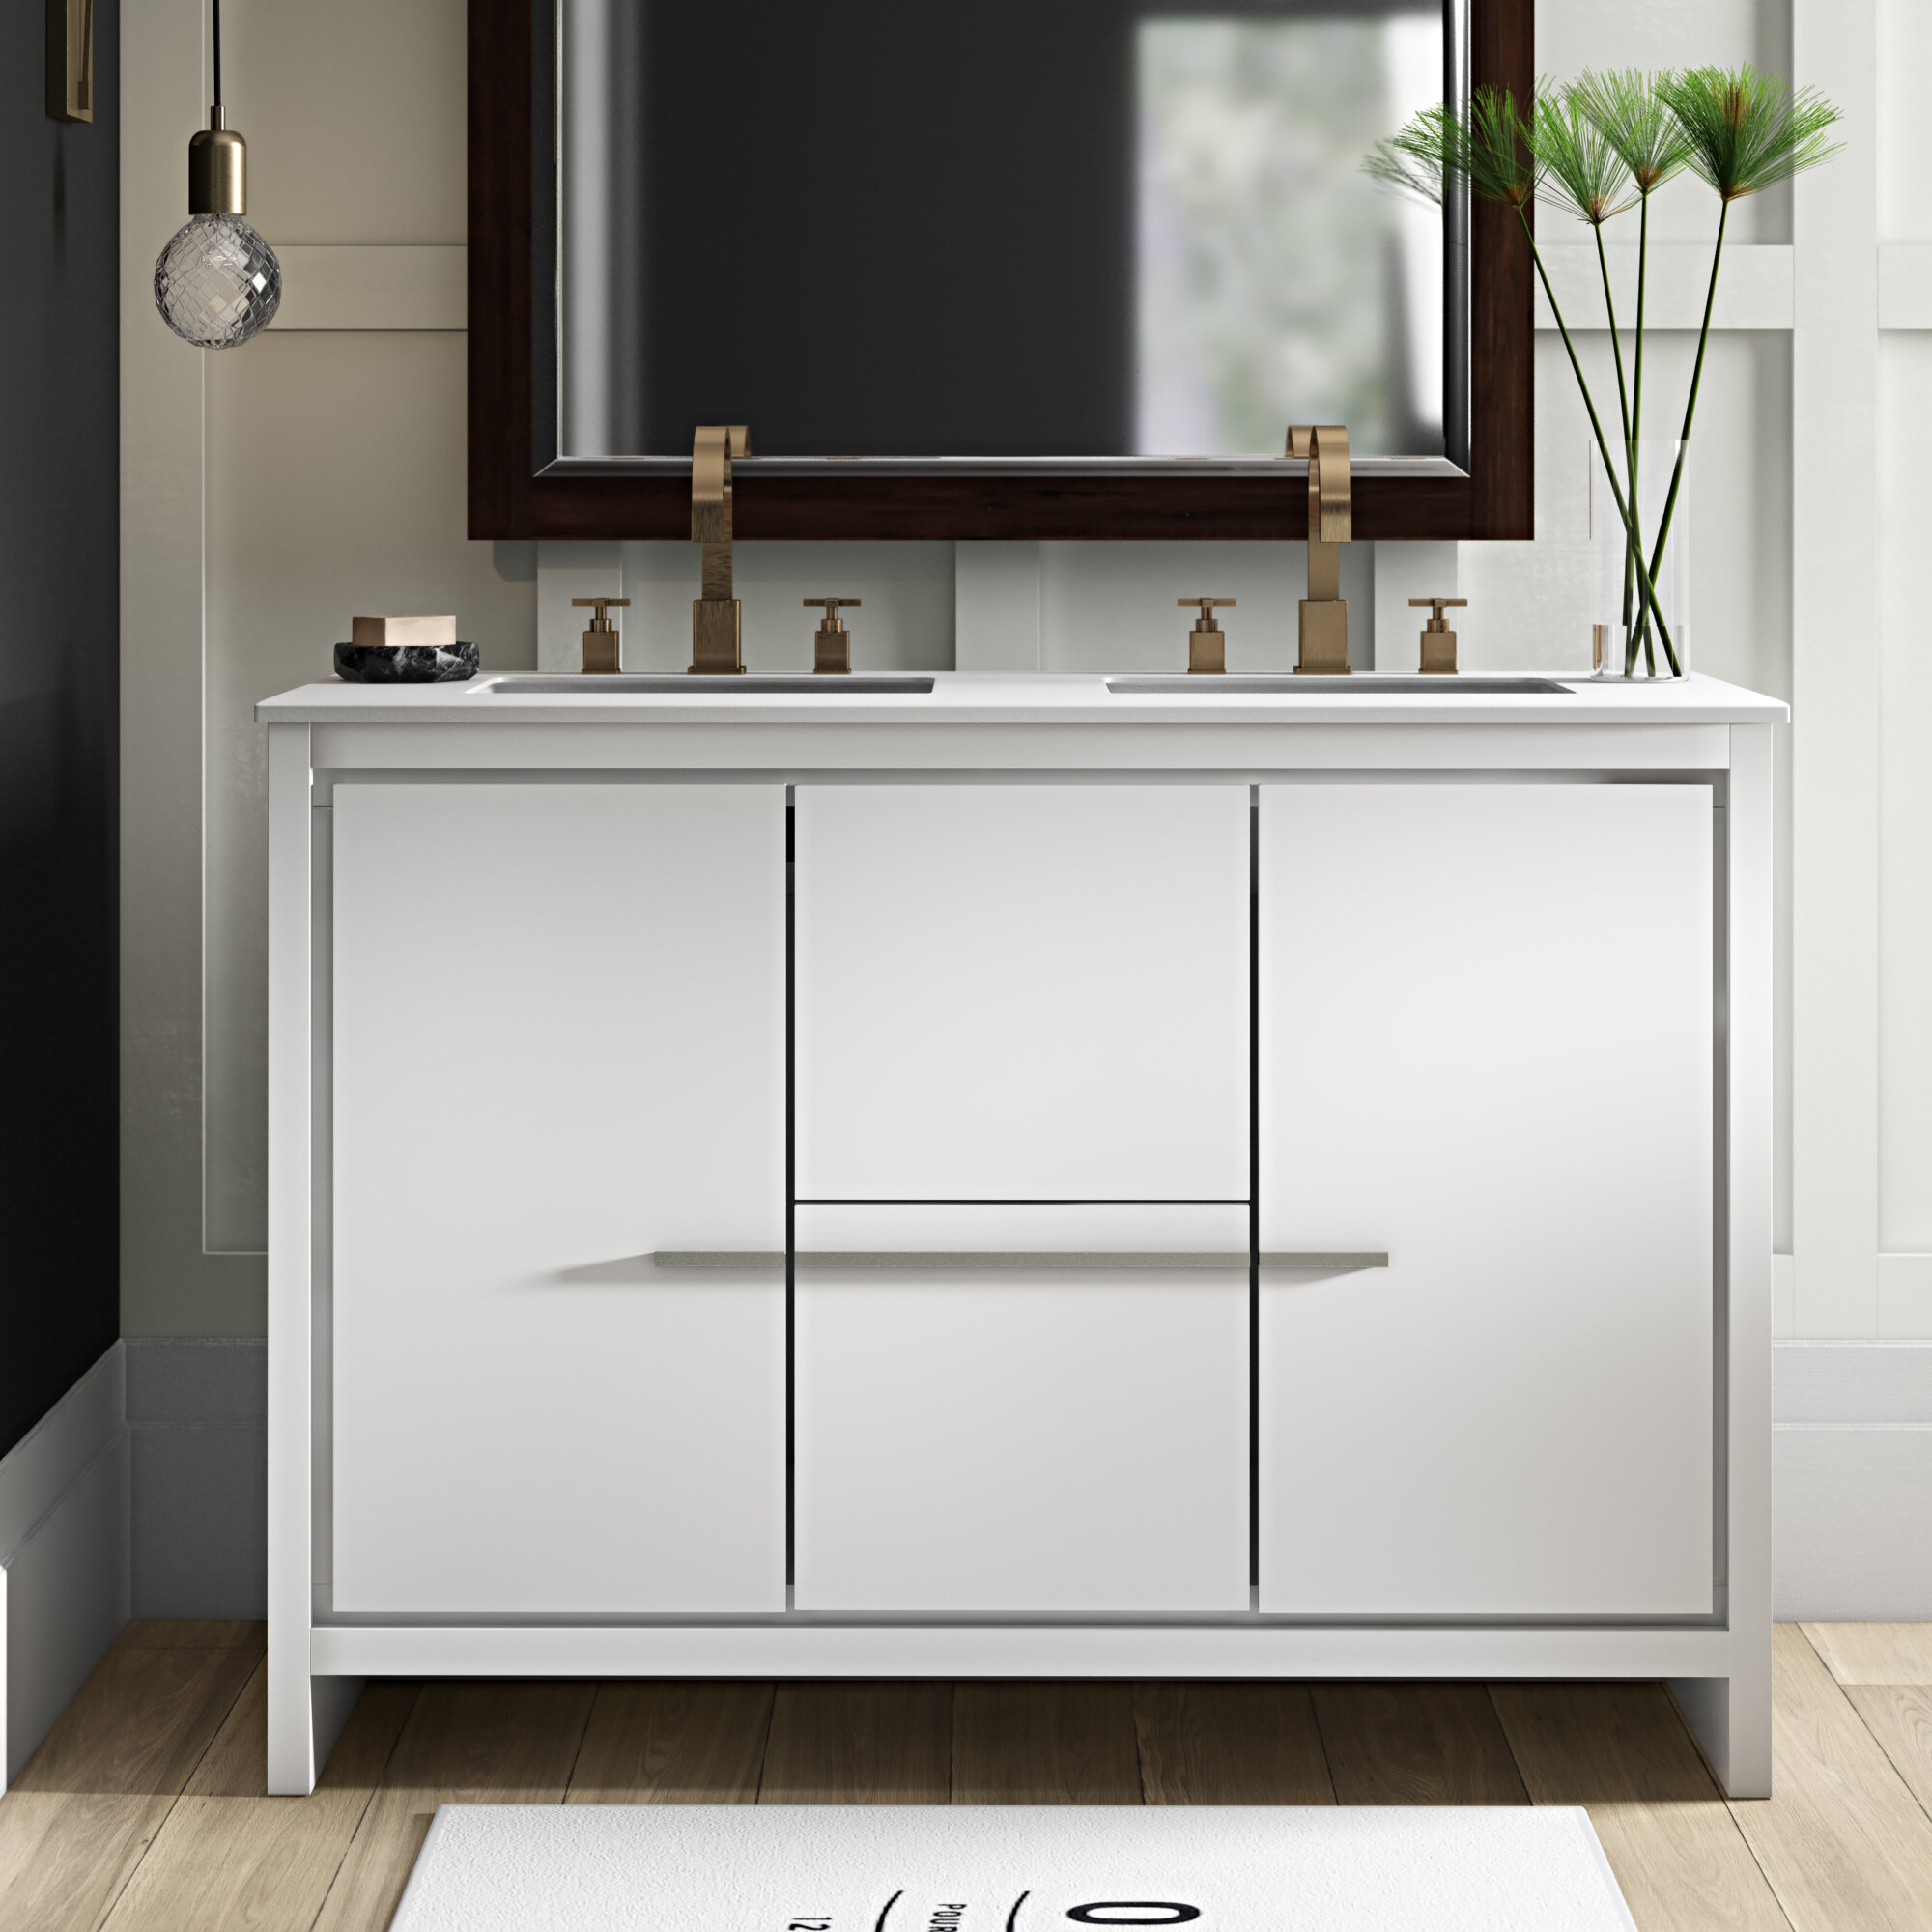 Swell Bosley 48 Double Sink Modern Bathroom Vanity Set Interior Design Ideas Gentotryabchikinfo